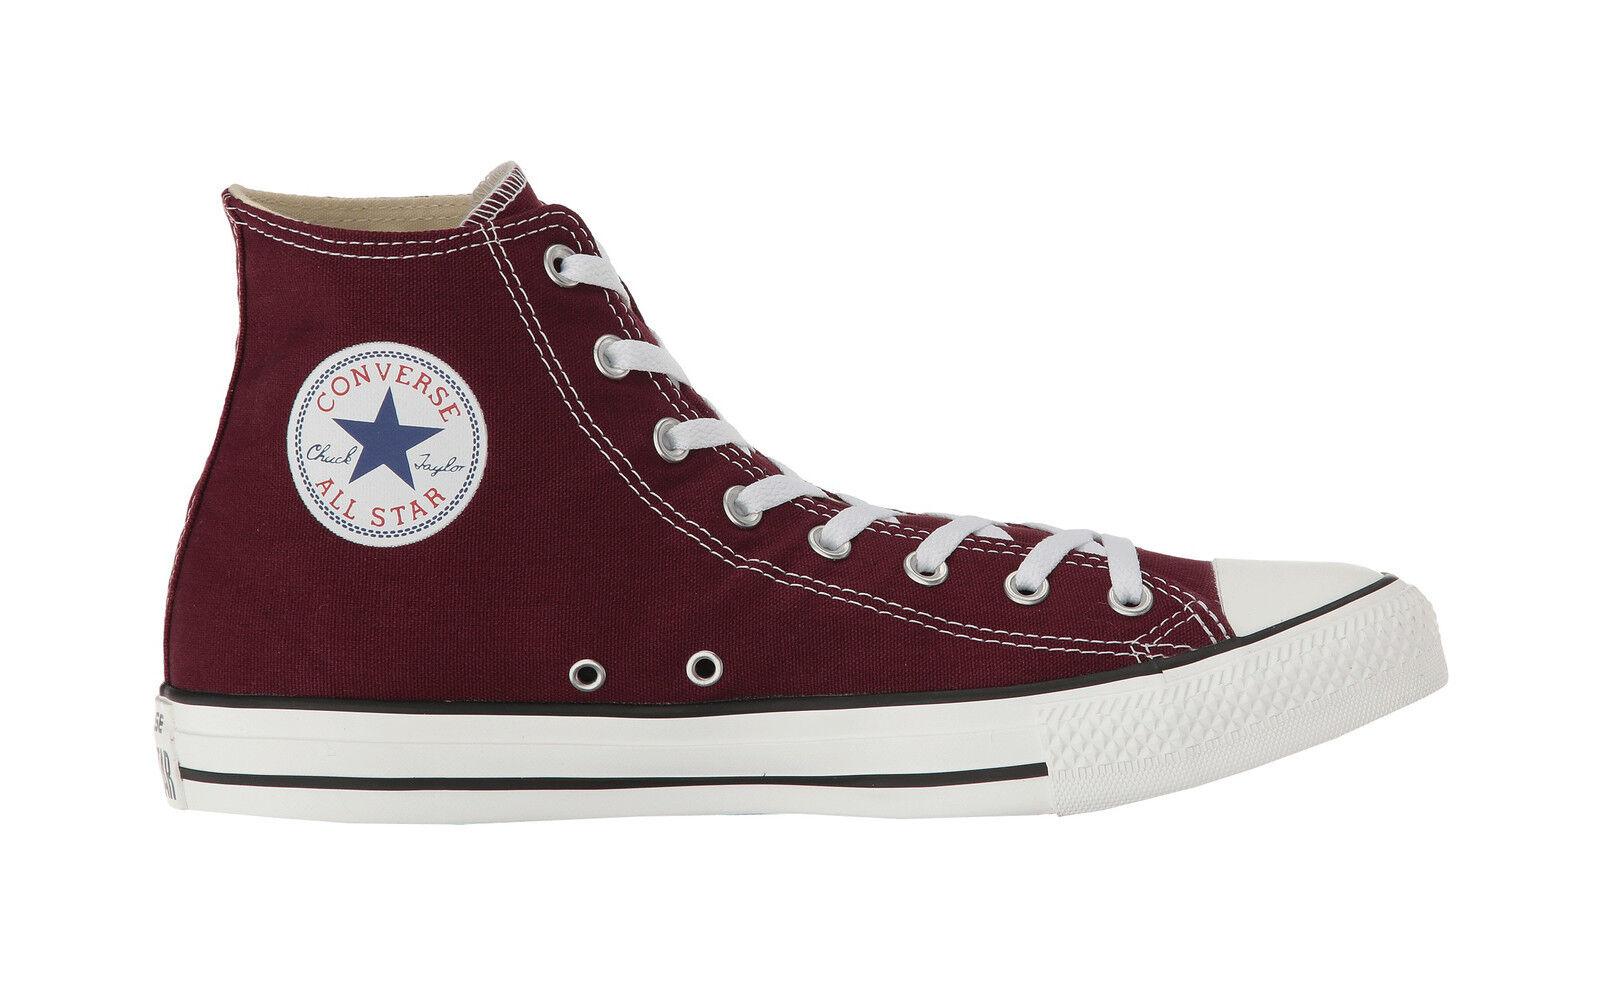 Converse Schuhes Chuck Taylor All Star High Top Herren Canvas  Herren Top Sneakers- Burgundy 2a7ca6